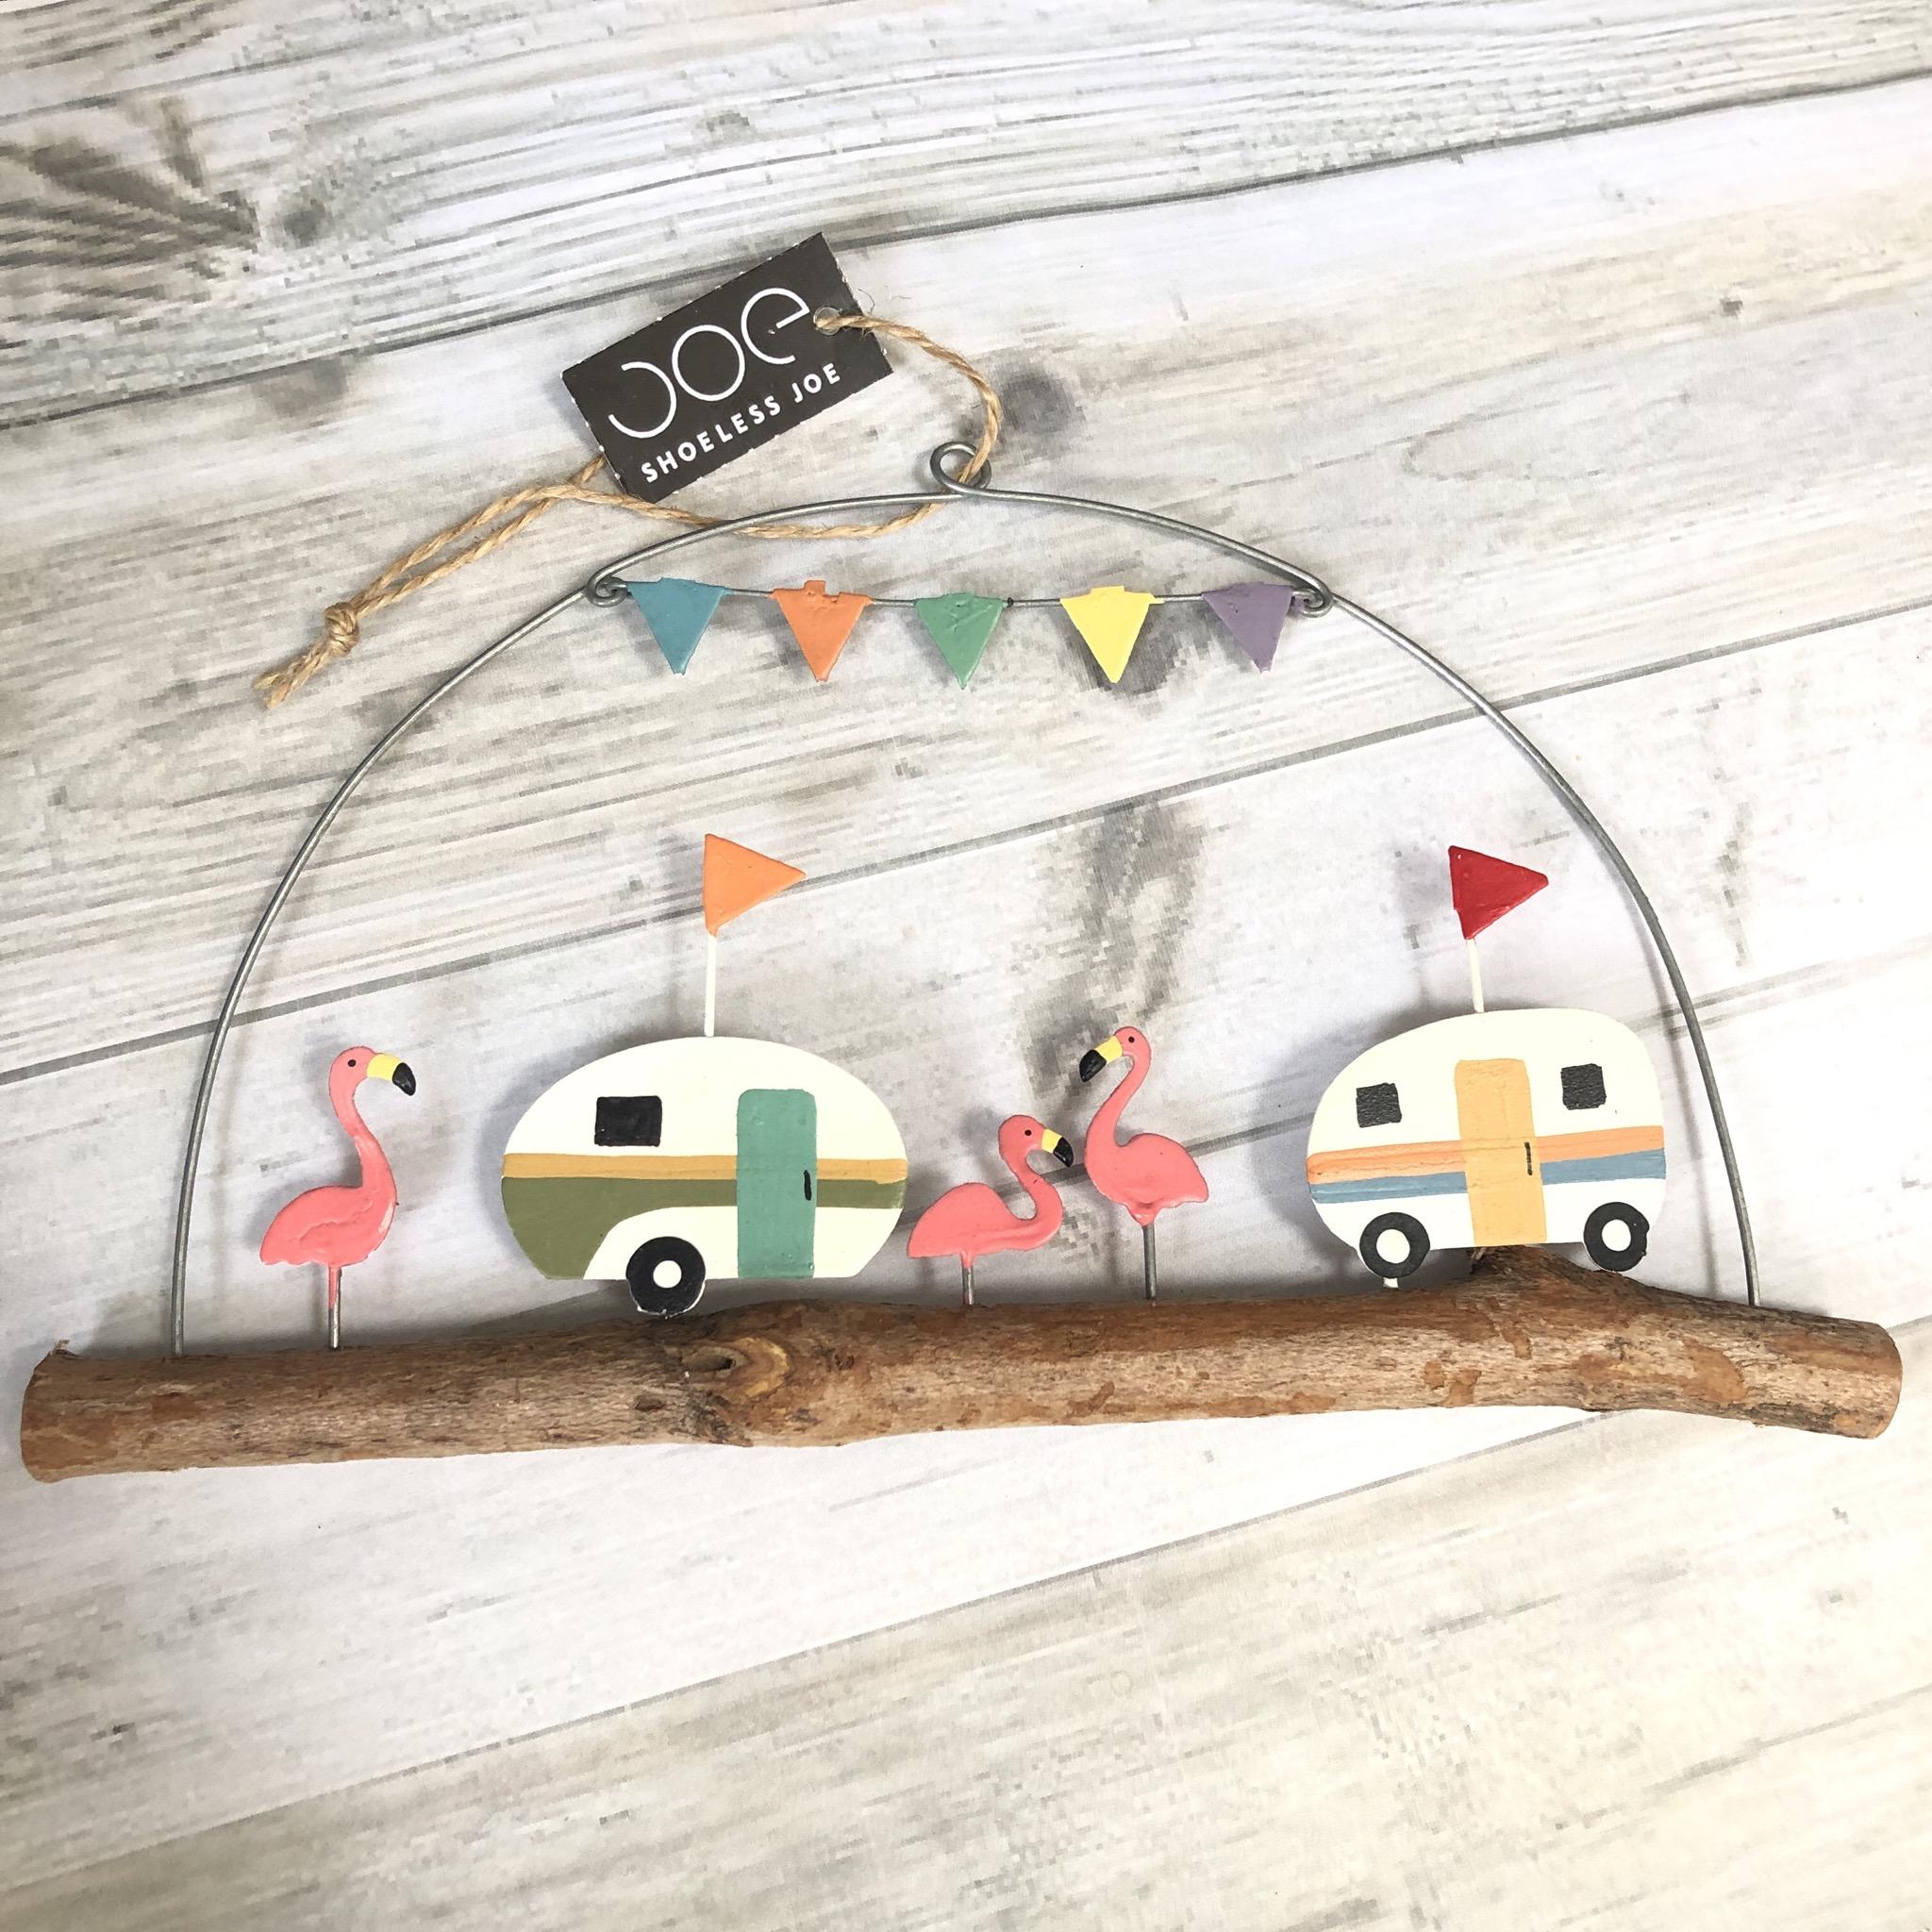 Retro Caravan and flamingo on stick hanging decoration by shoeless joe